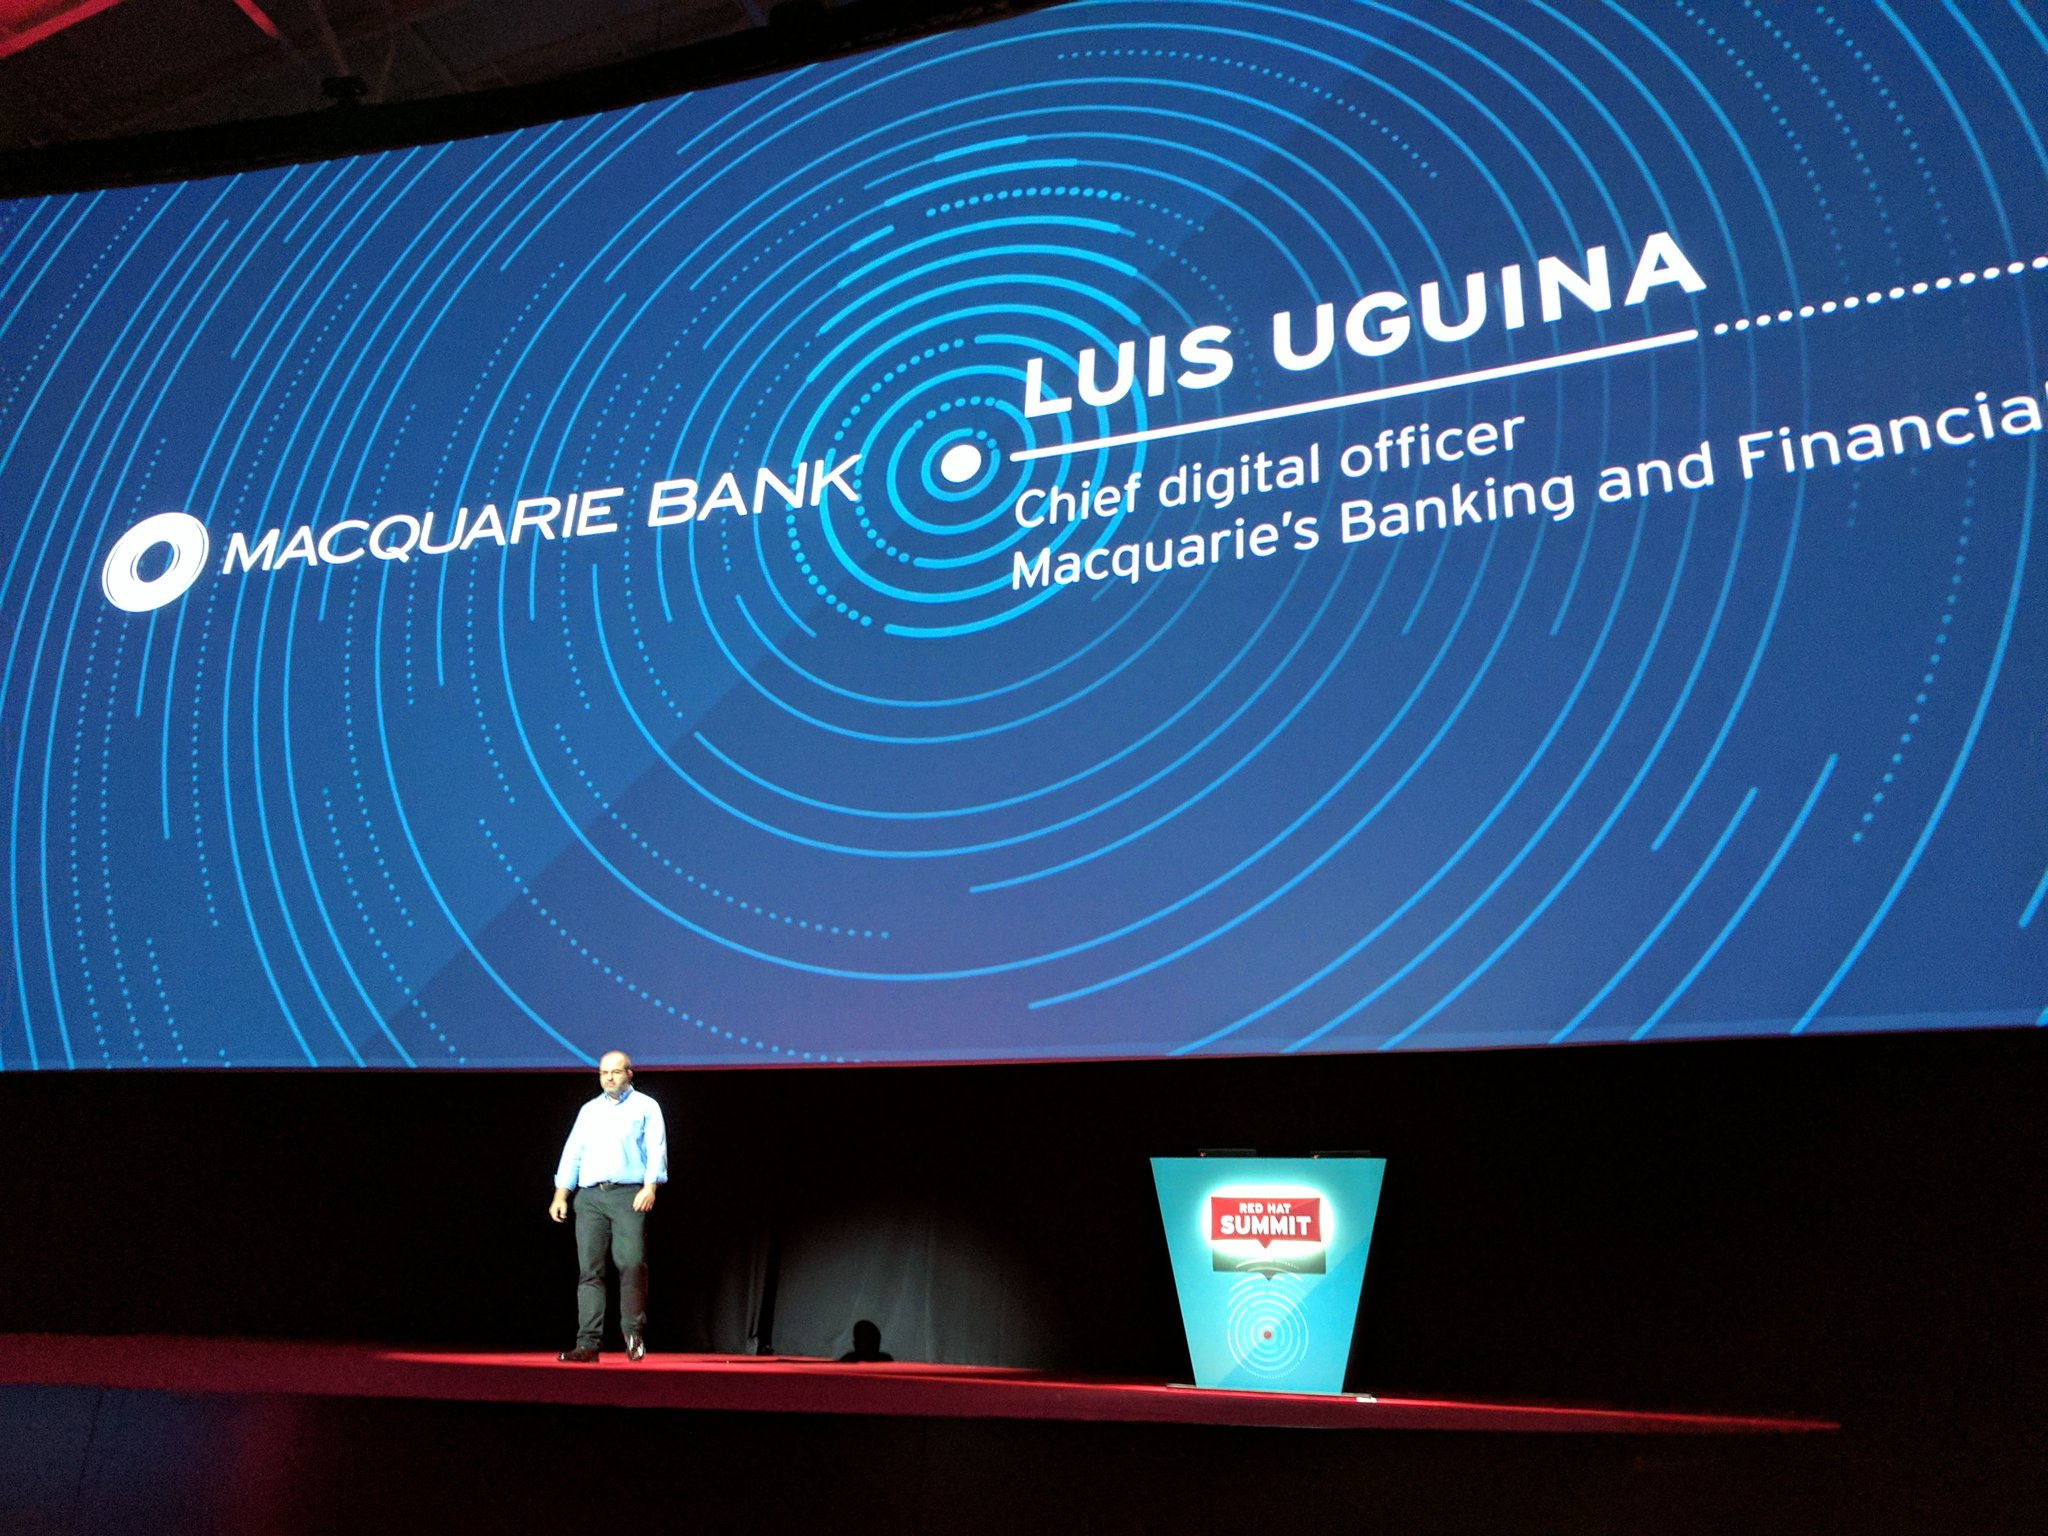 Next up -  @RedHat innovator of the Year -  @luguina of @macquariebank from downunder #RHSummit https://t.co/sOKJvTfzNa